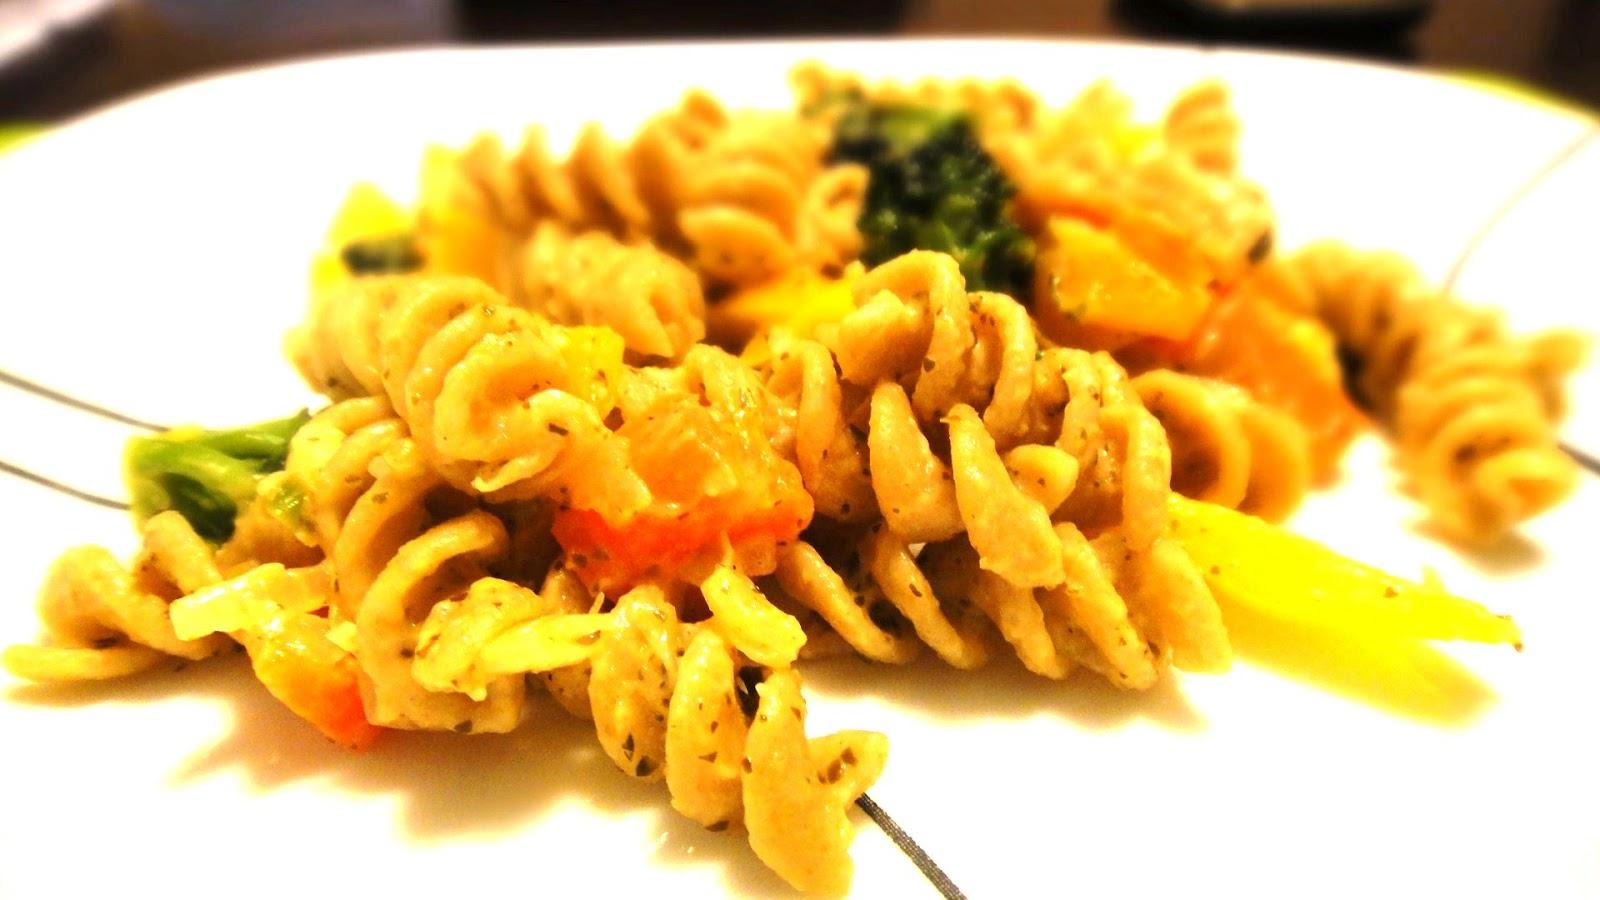 Kerala recipetamilnadu recipediet and healthnutrition how to make wheat pasta indian recipe a vegetarian break fast forumfinder Image collections